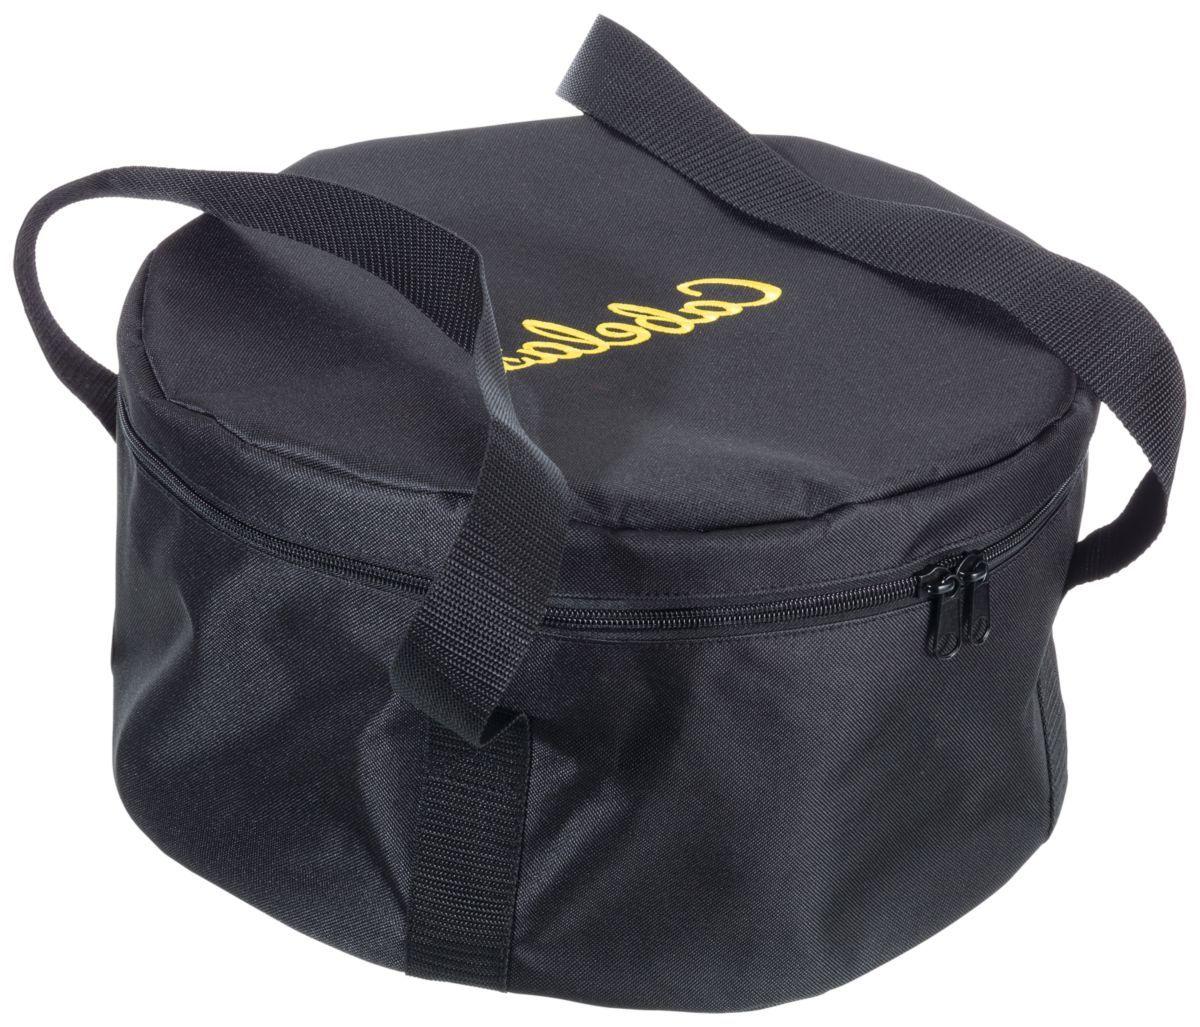 Cabela's Dutch Oven Tote Bag